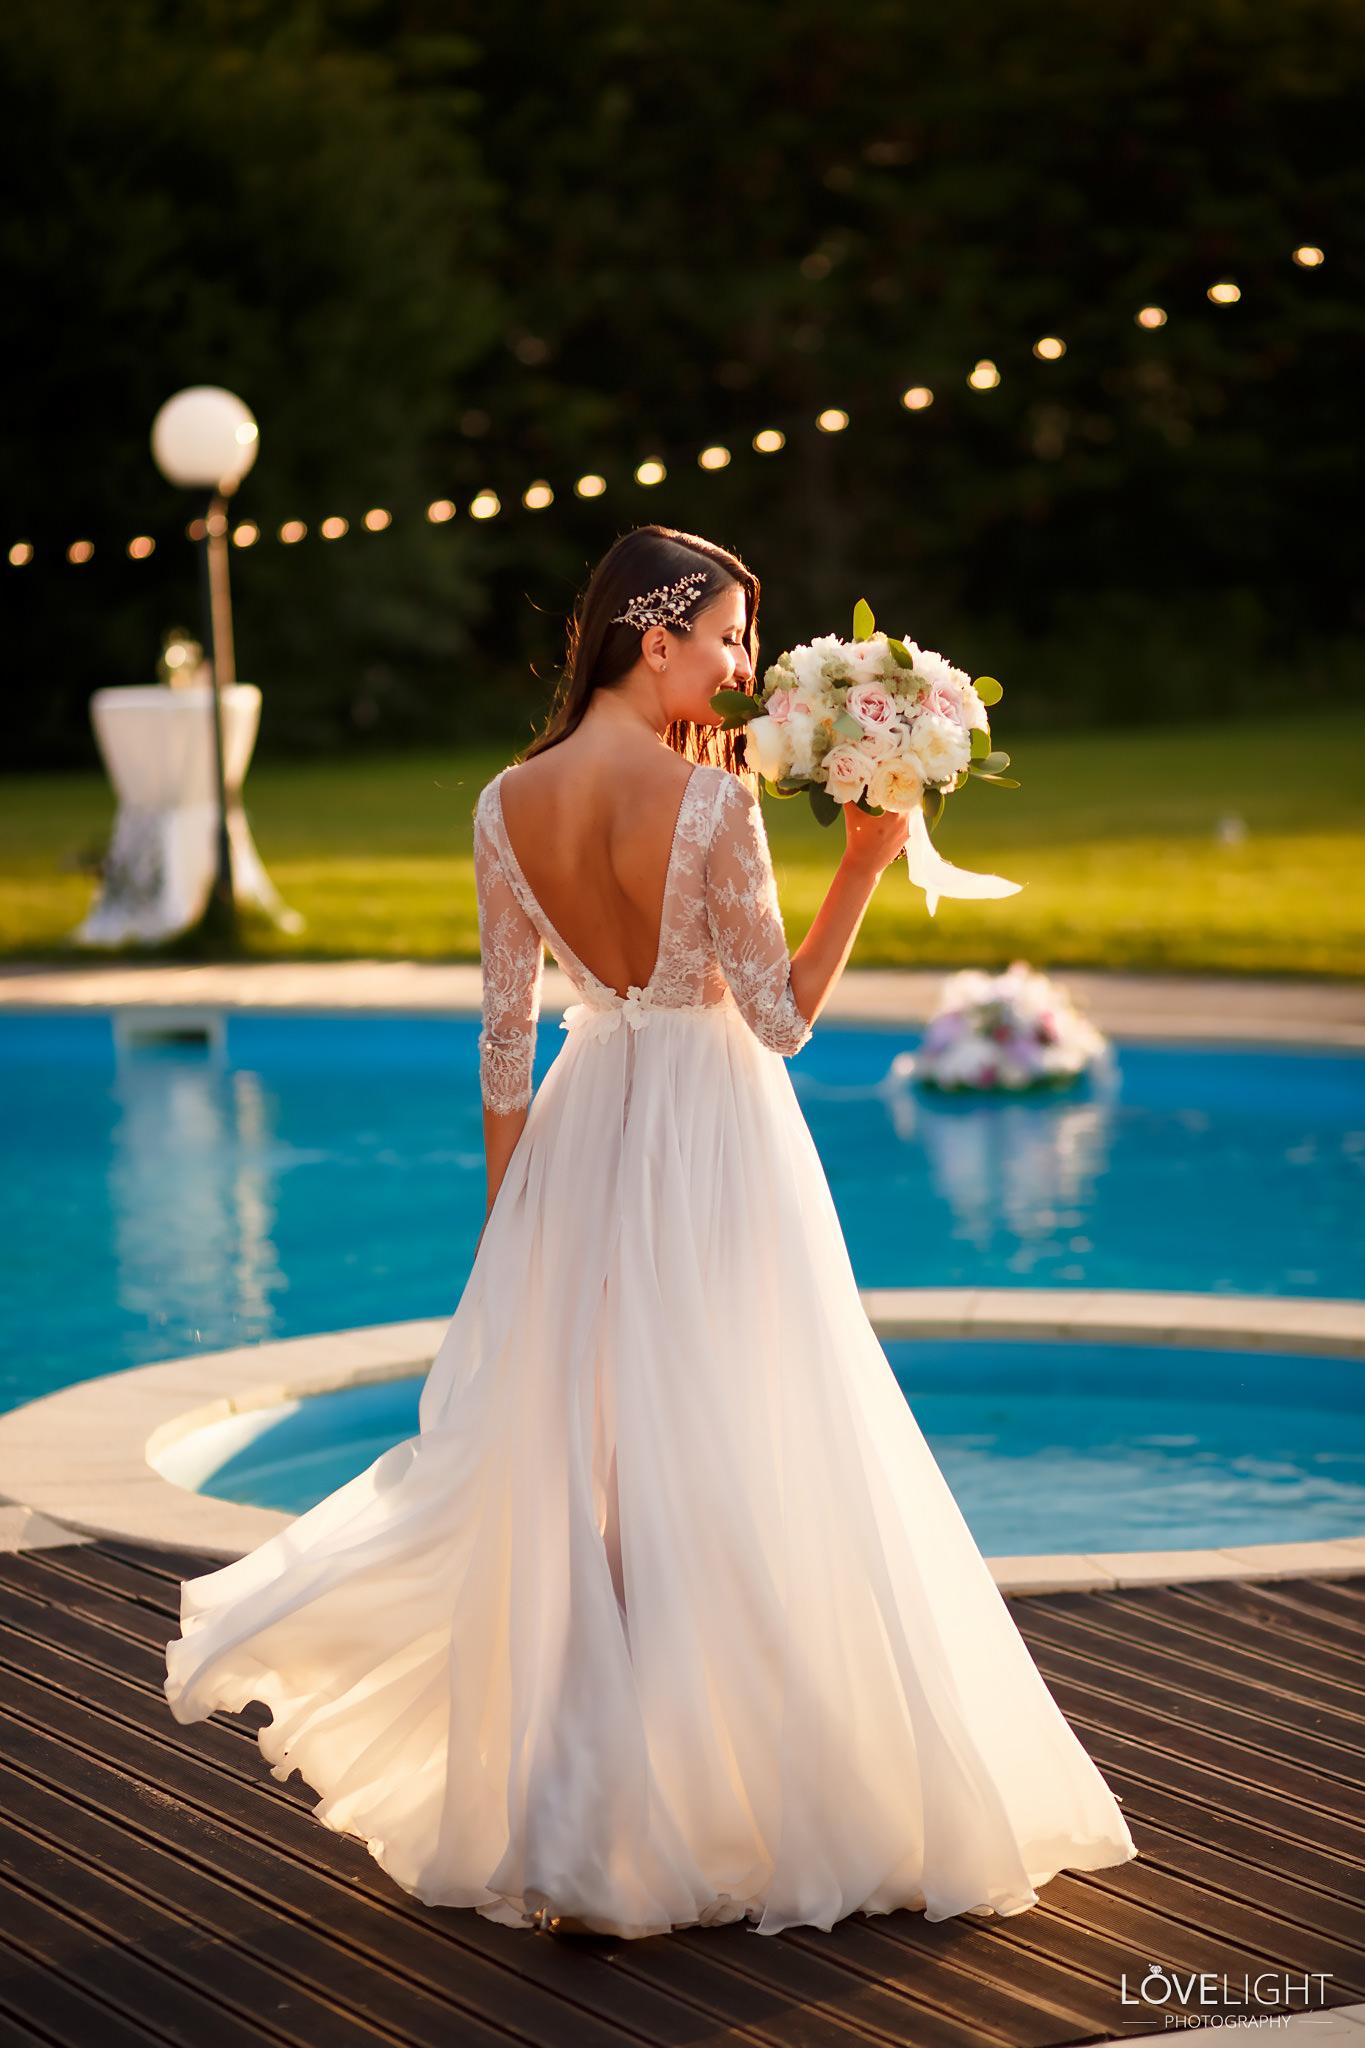 fotograf nunta bucuresti lovelight photography 0027